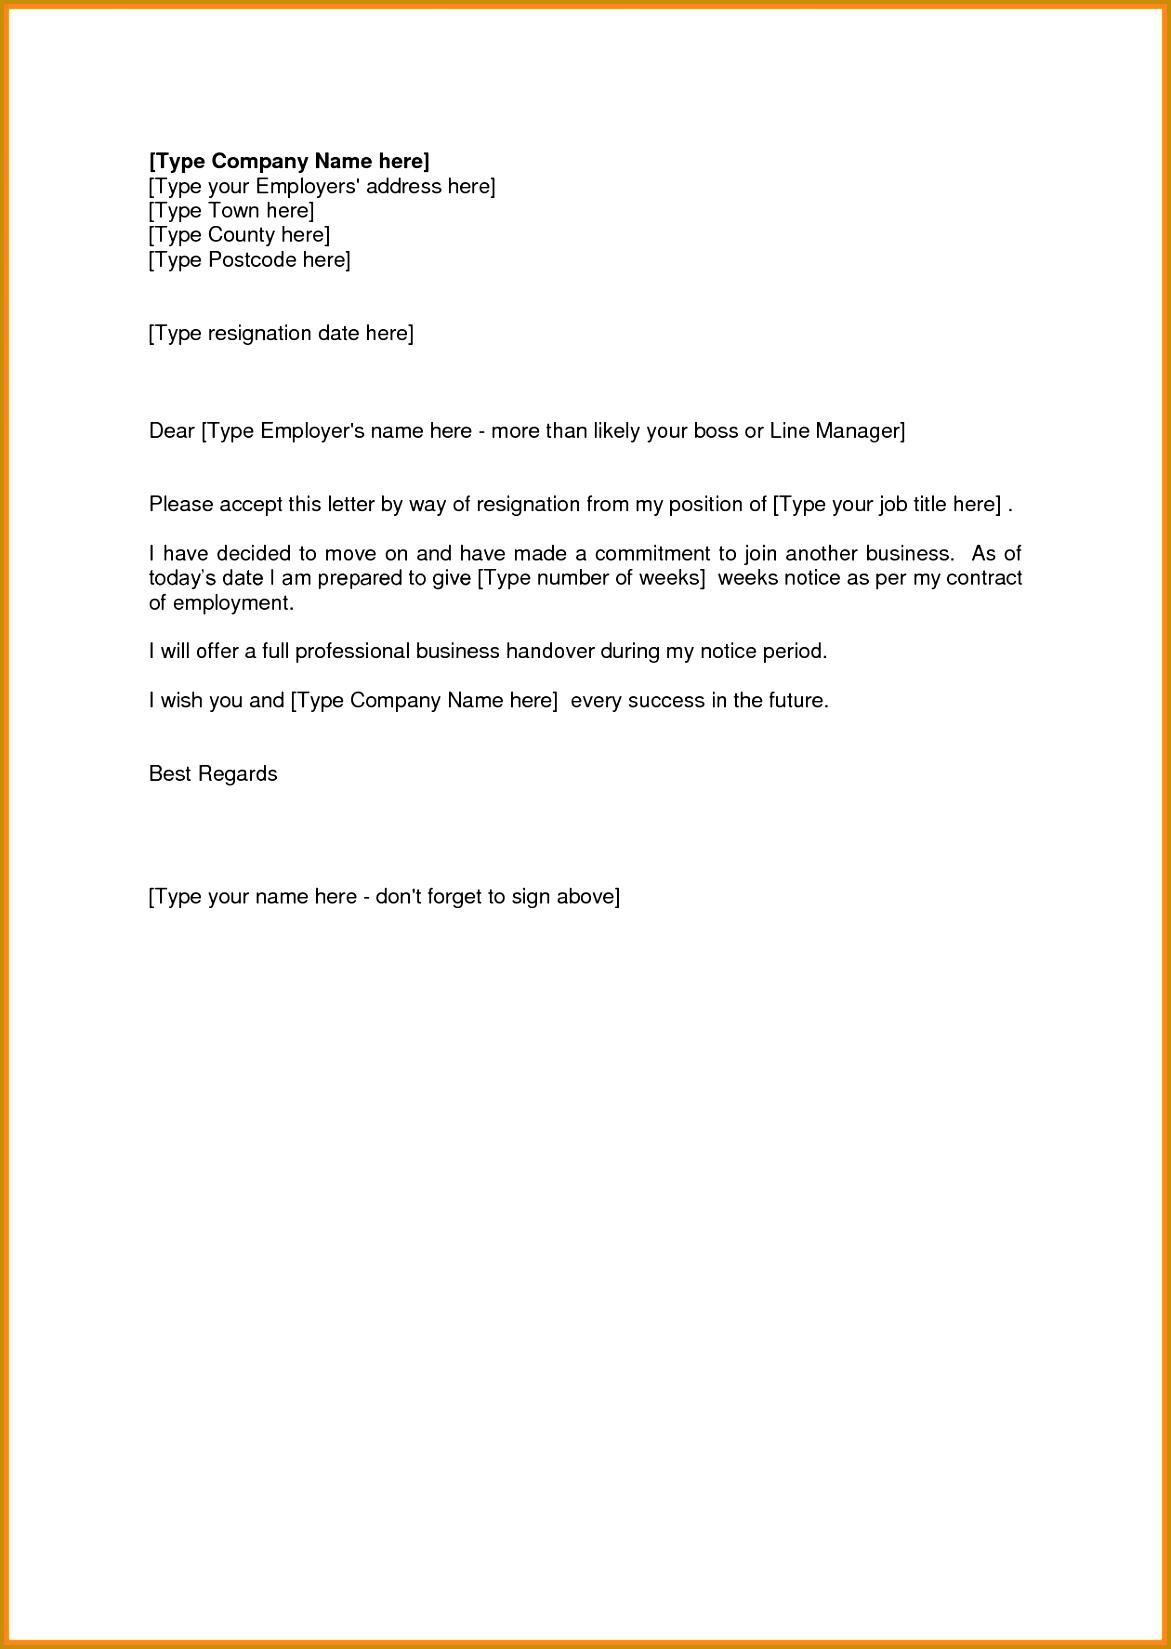 Sample Resignation Letter 2 Weeks Notice 4 Sample Resignation Letter 2 Weeks Notice Pdf 16491171